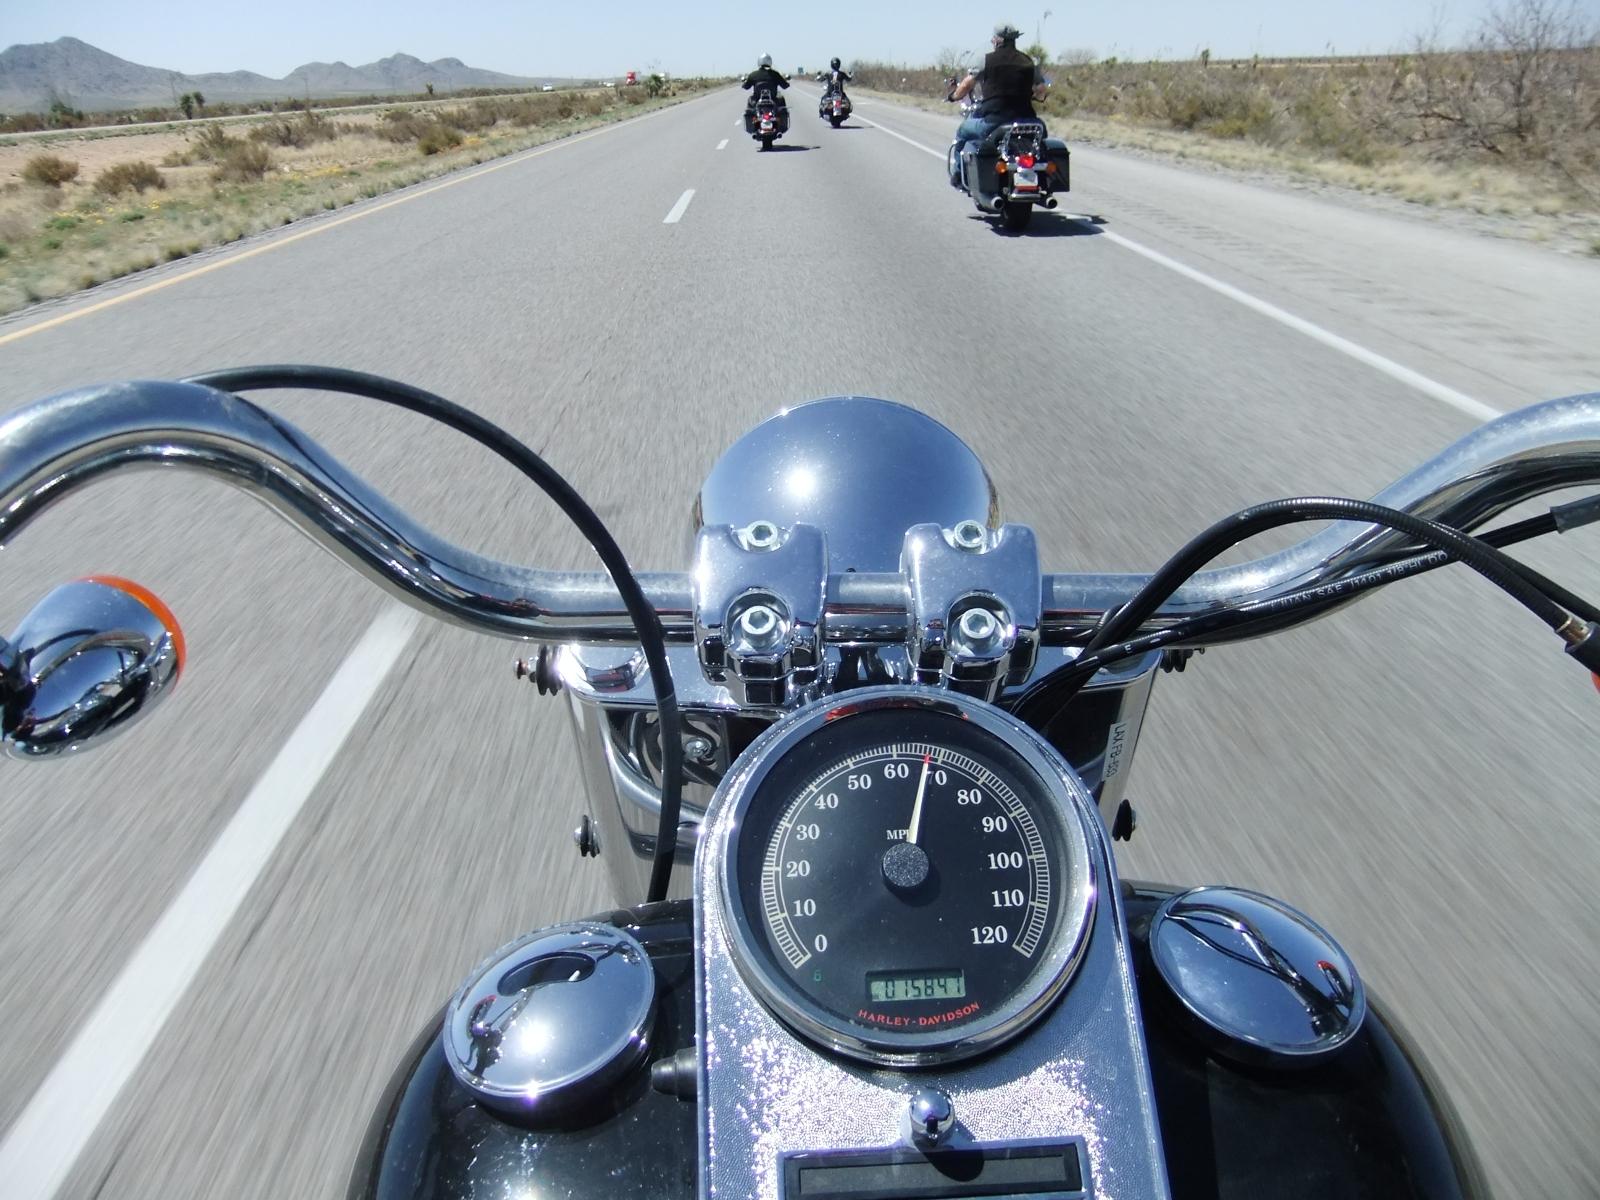 Eagle Rider Route 66 Motorradreisen Motorradreisen Mietmotorrad Harley mieten usa